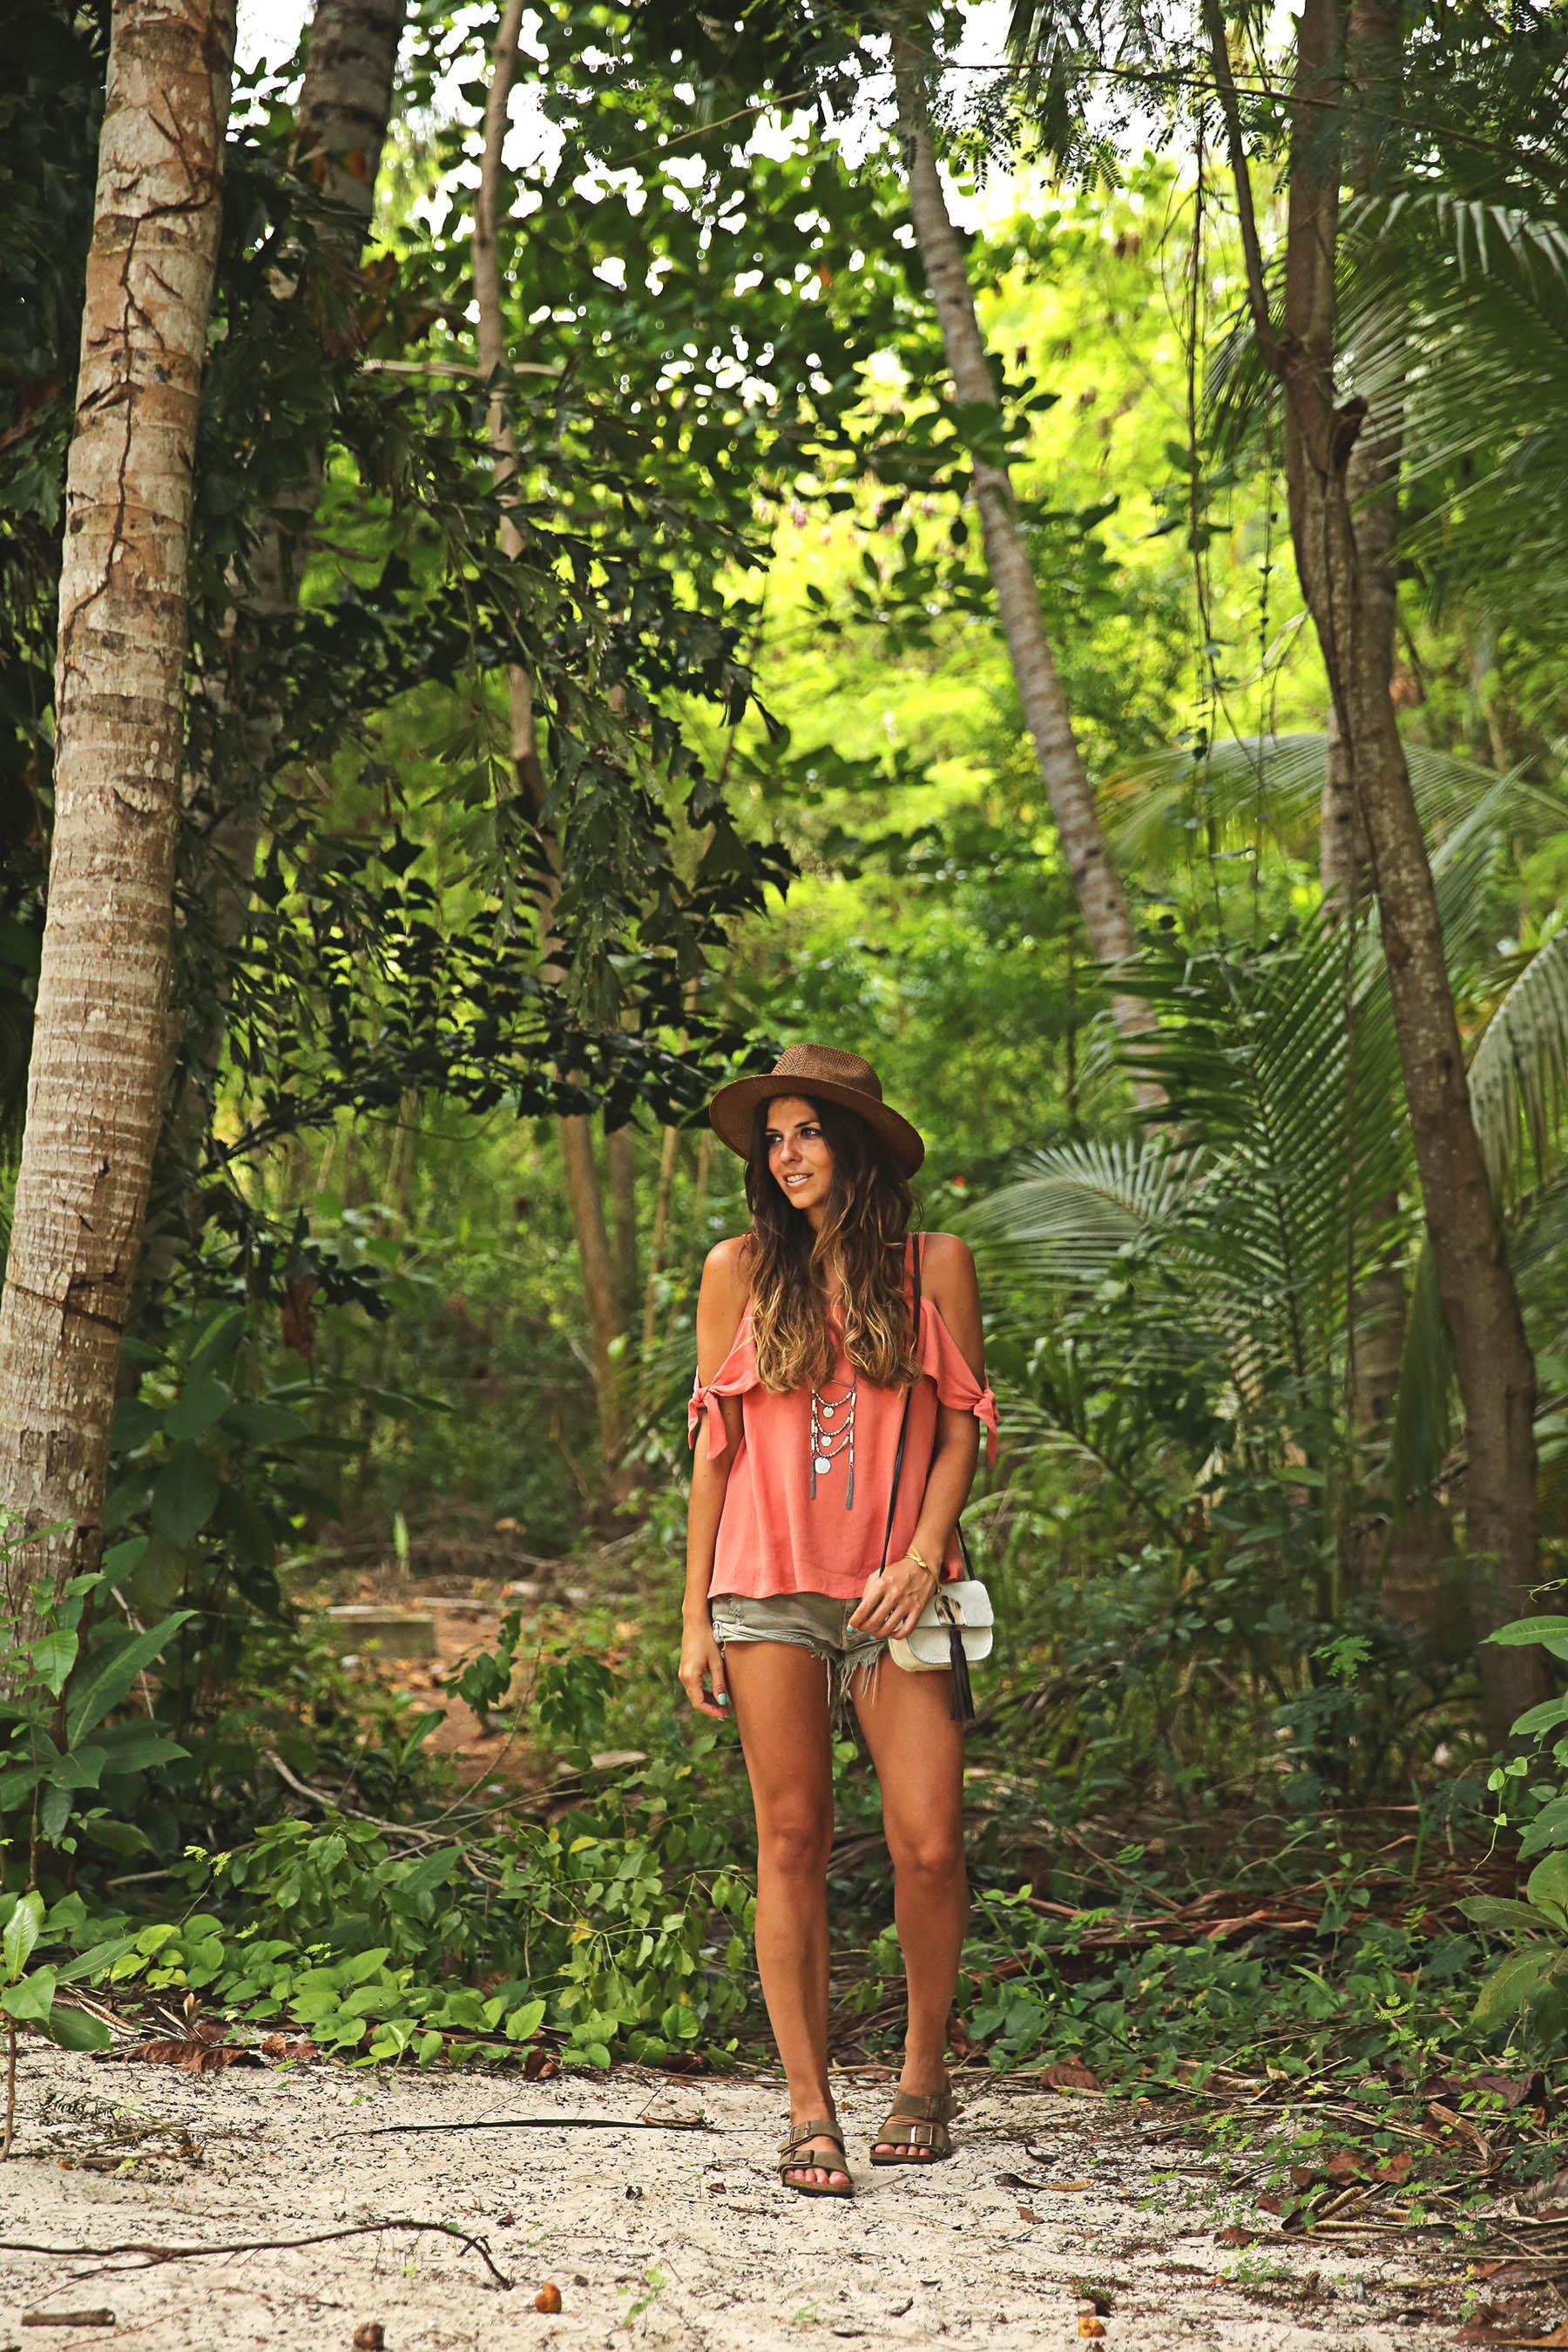 trendy-taste-look-outfit-street-style-ootd-blog-blogger-fashion-spain-moda-españa-boho-hippie-verano-birkenstock-bavaro-barcelo-khaki-caqui-shorts-sombrero-top-11